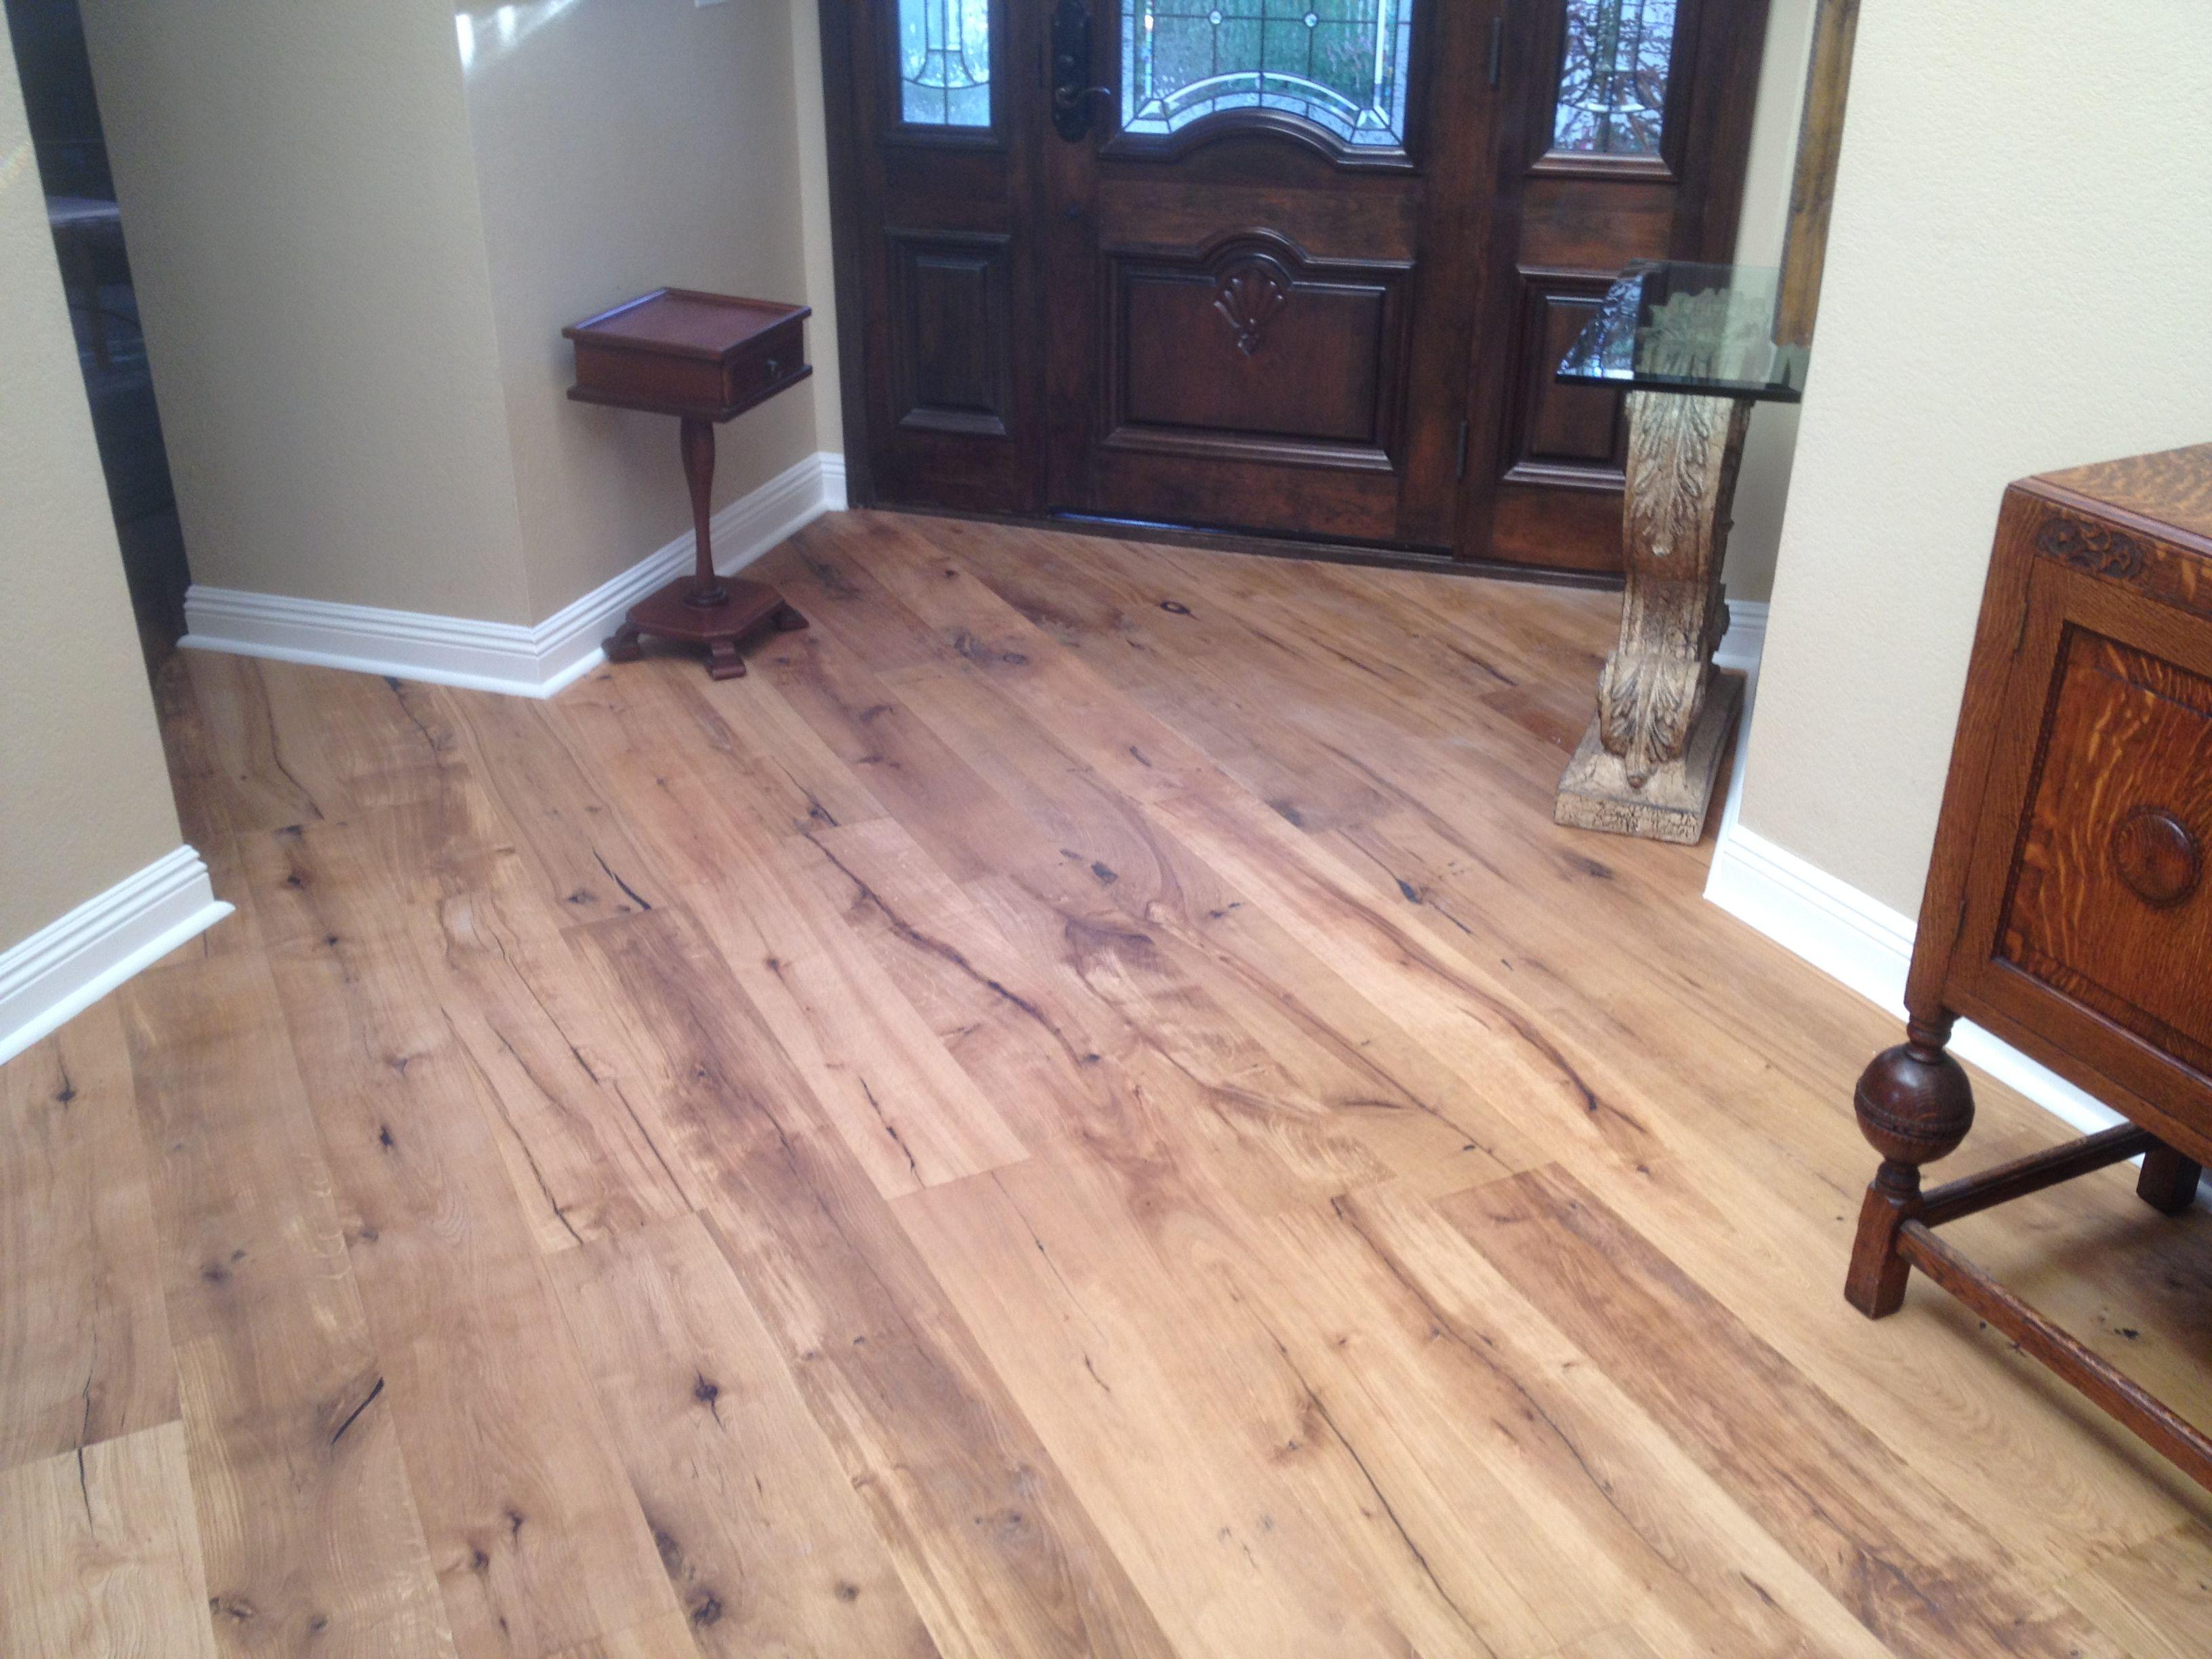 tile that looks like hardwood floors Like You Got A New